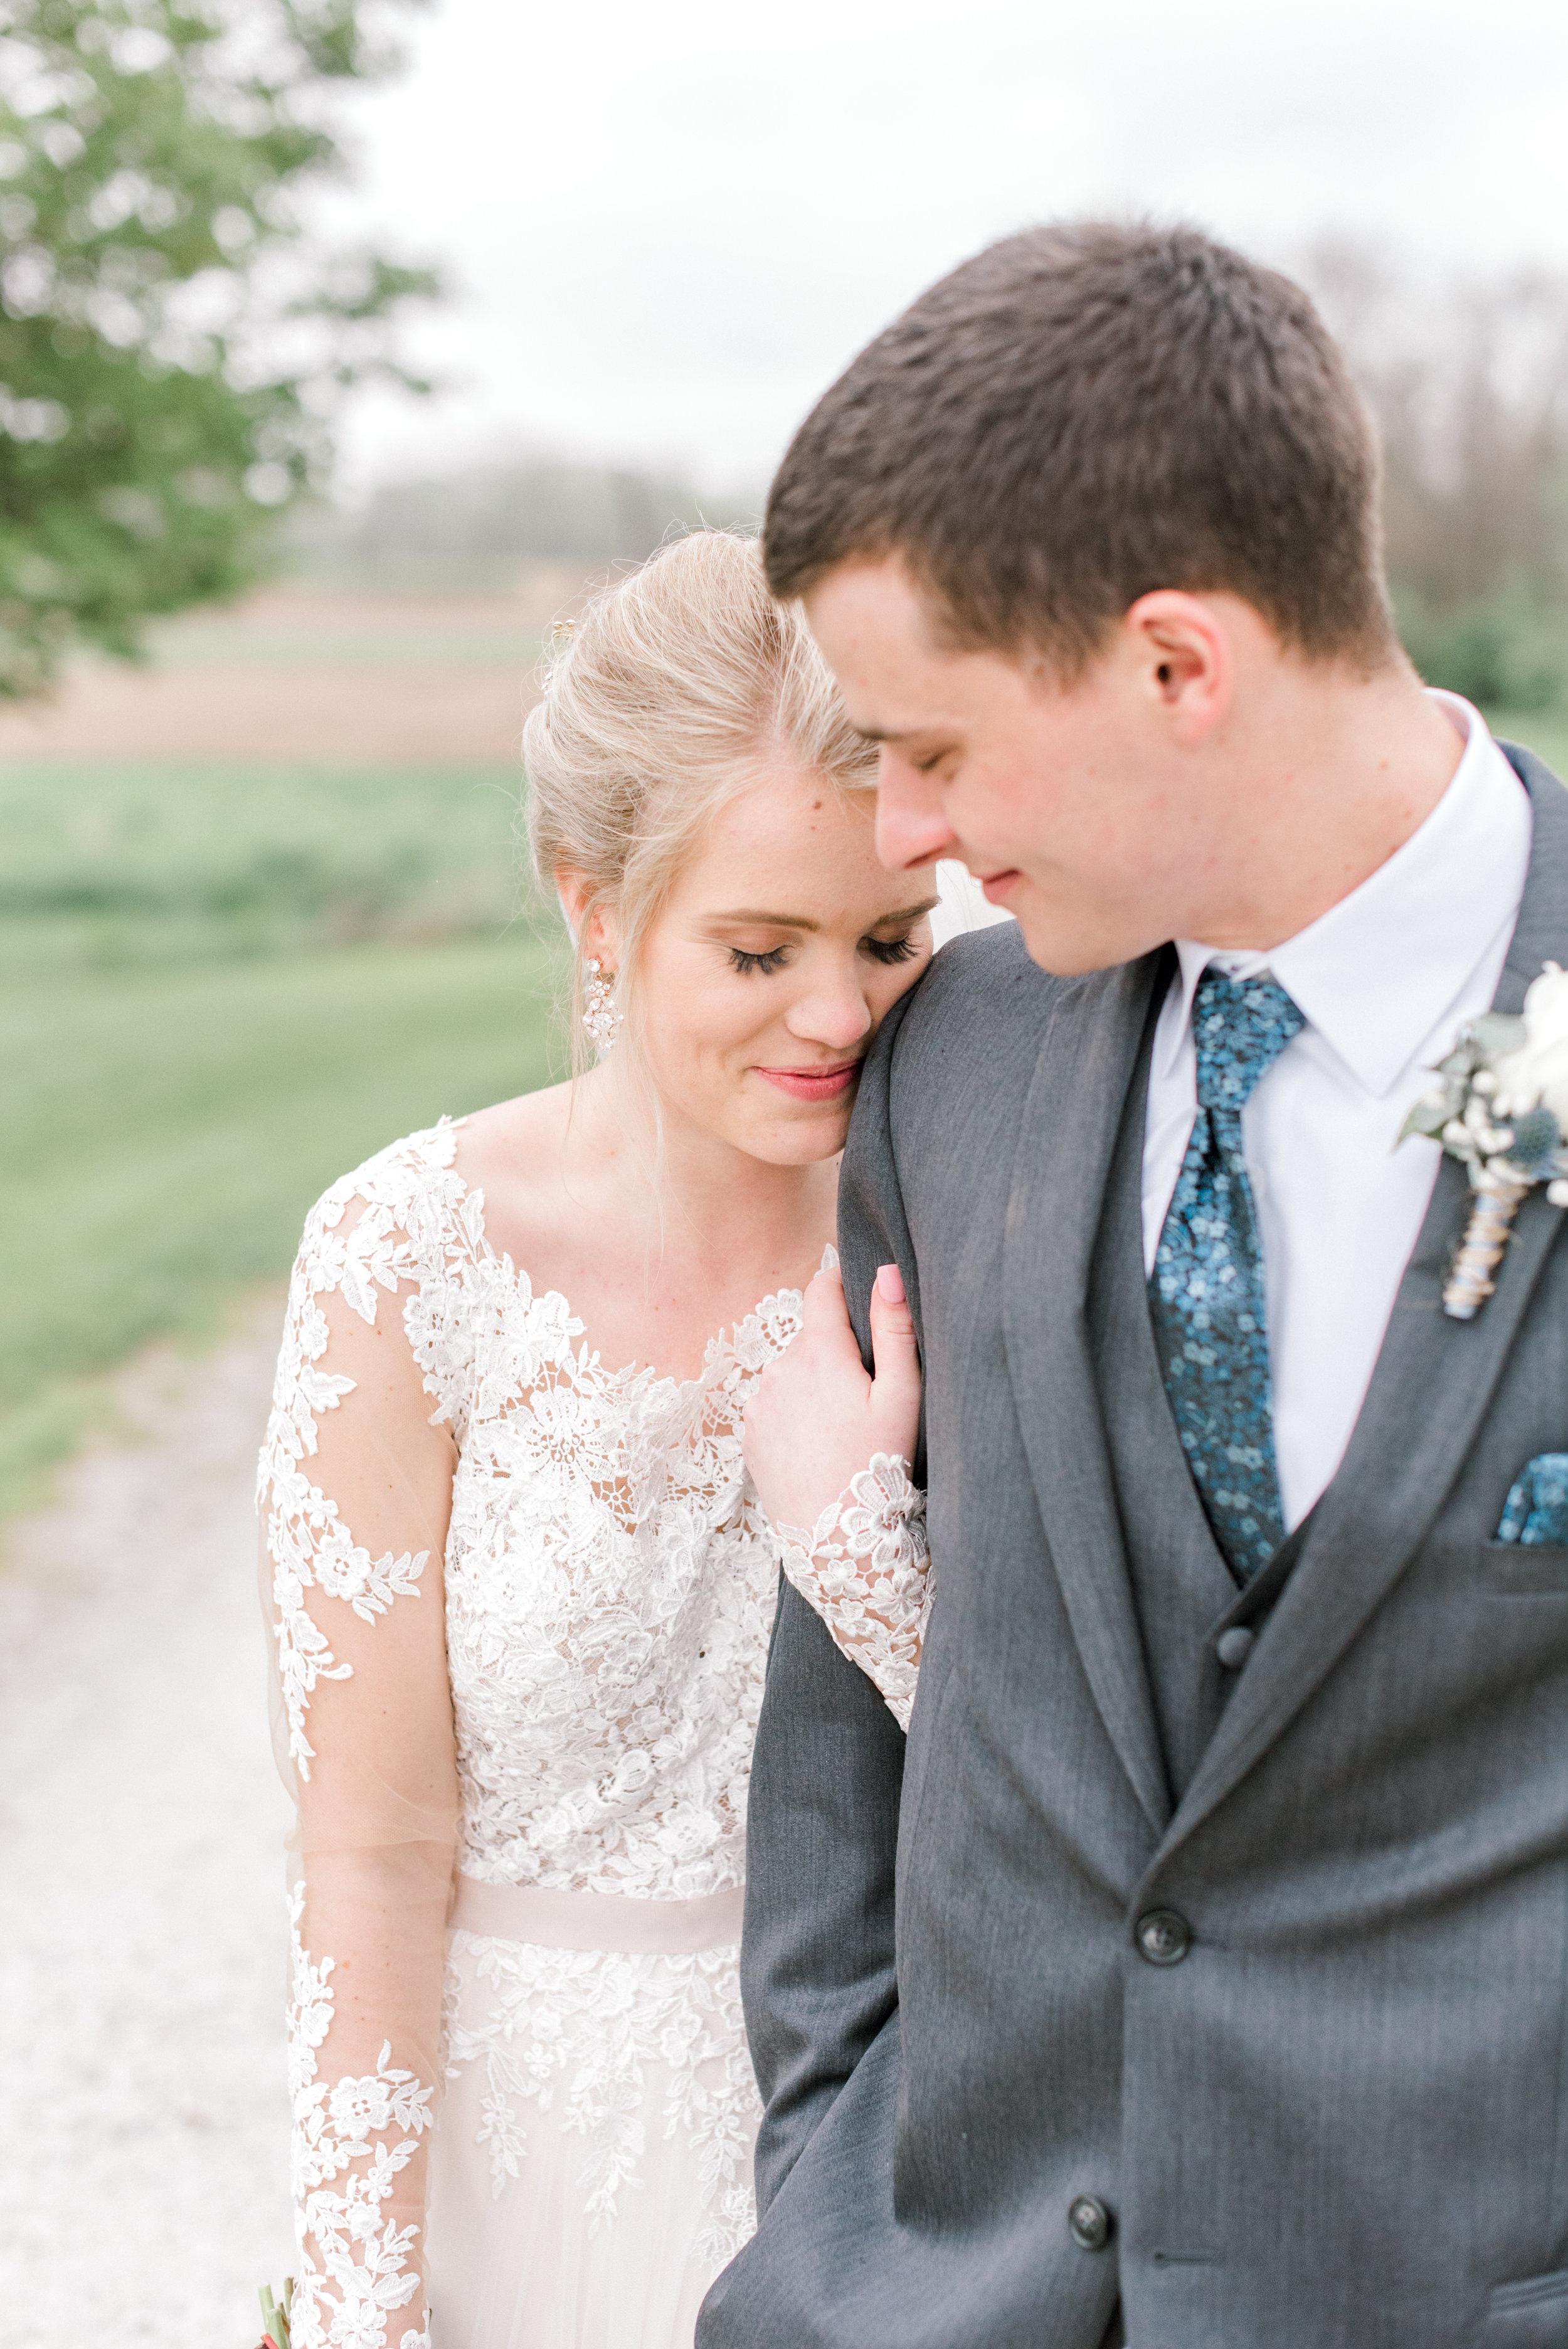 Sarah + Jared's Wedding 2019 Chapel Lane Photography Cincinnati Ohio (708 of 1135).jpg